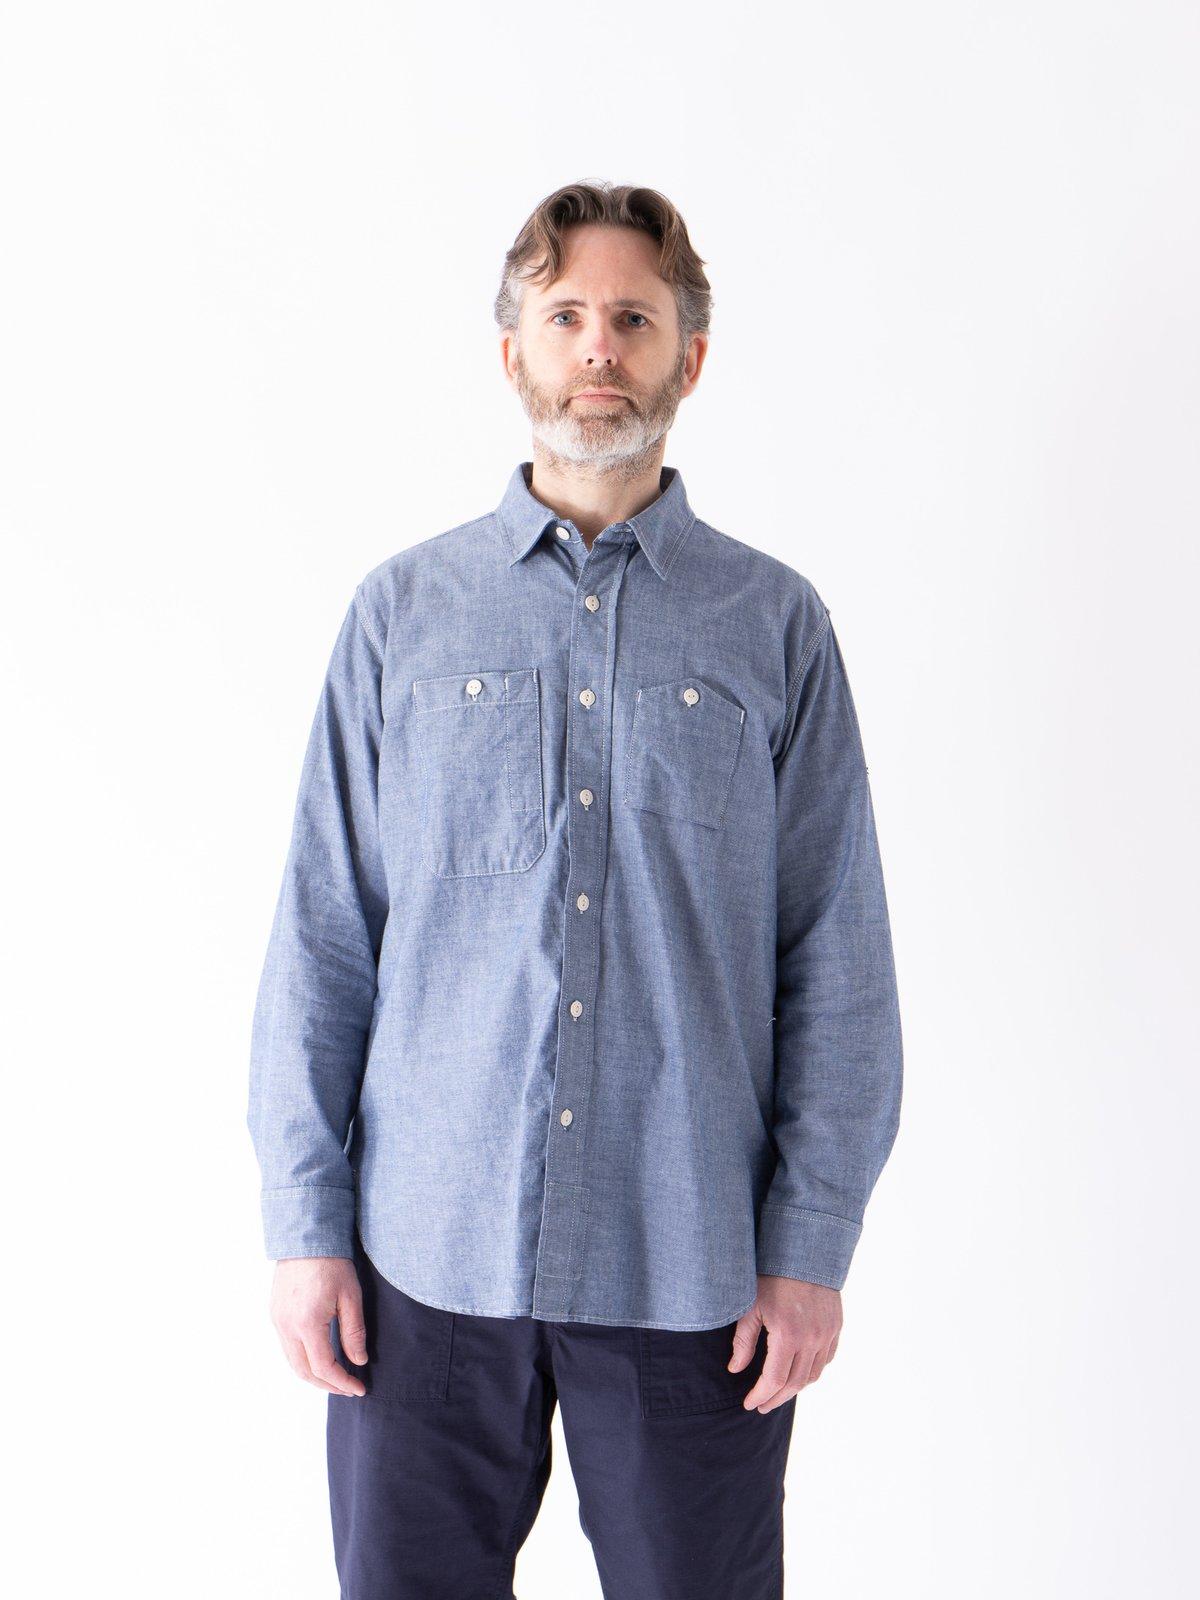 Blue Cotton Chambray Work Shirt - Image 2